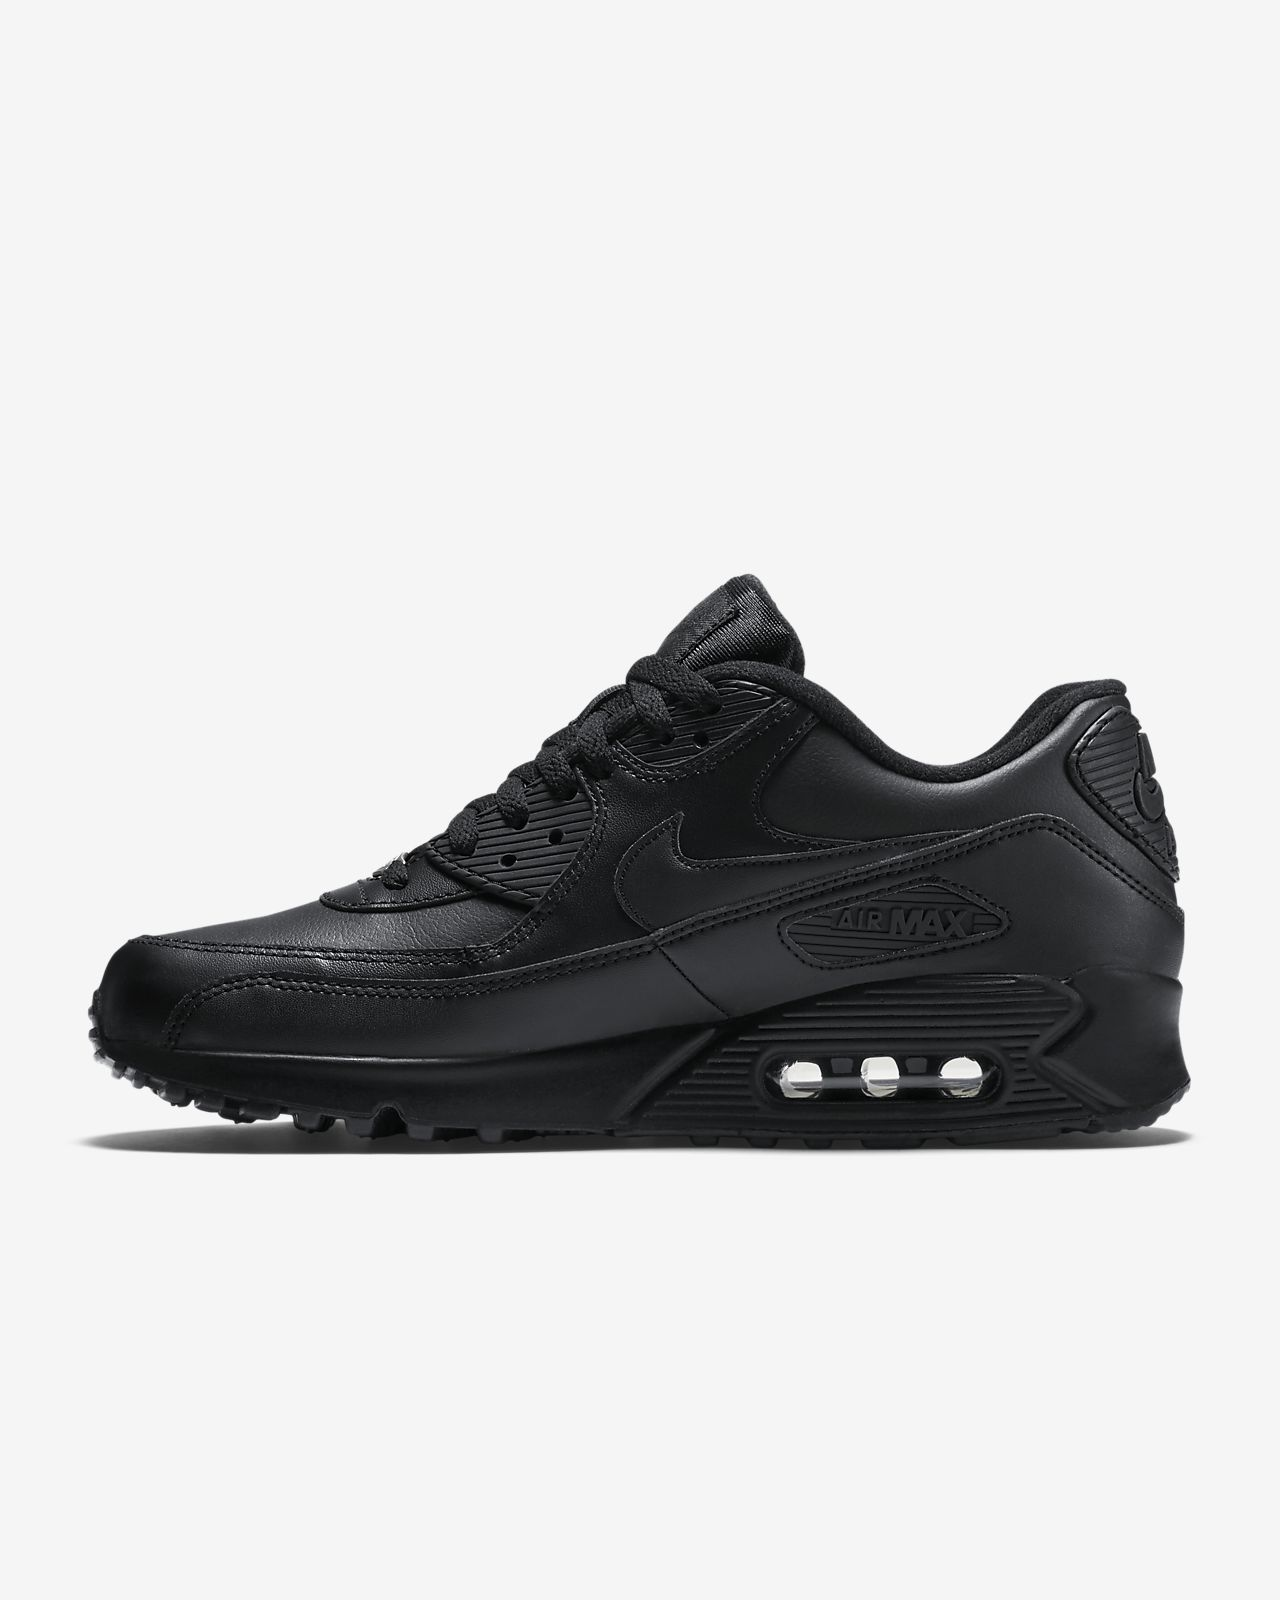 Scarpe Nike Air Max 90 Leather 302519 001 Nero | eBay